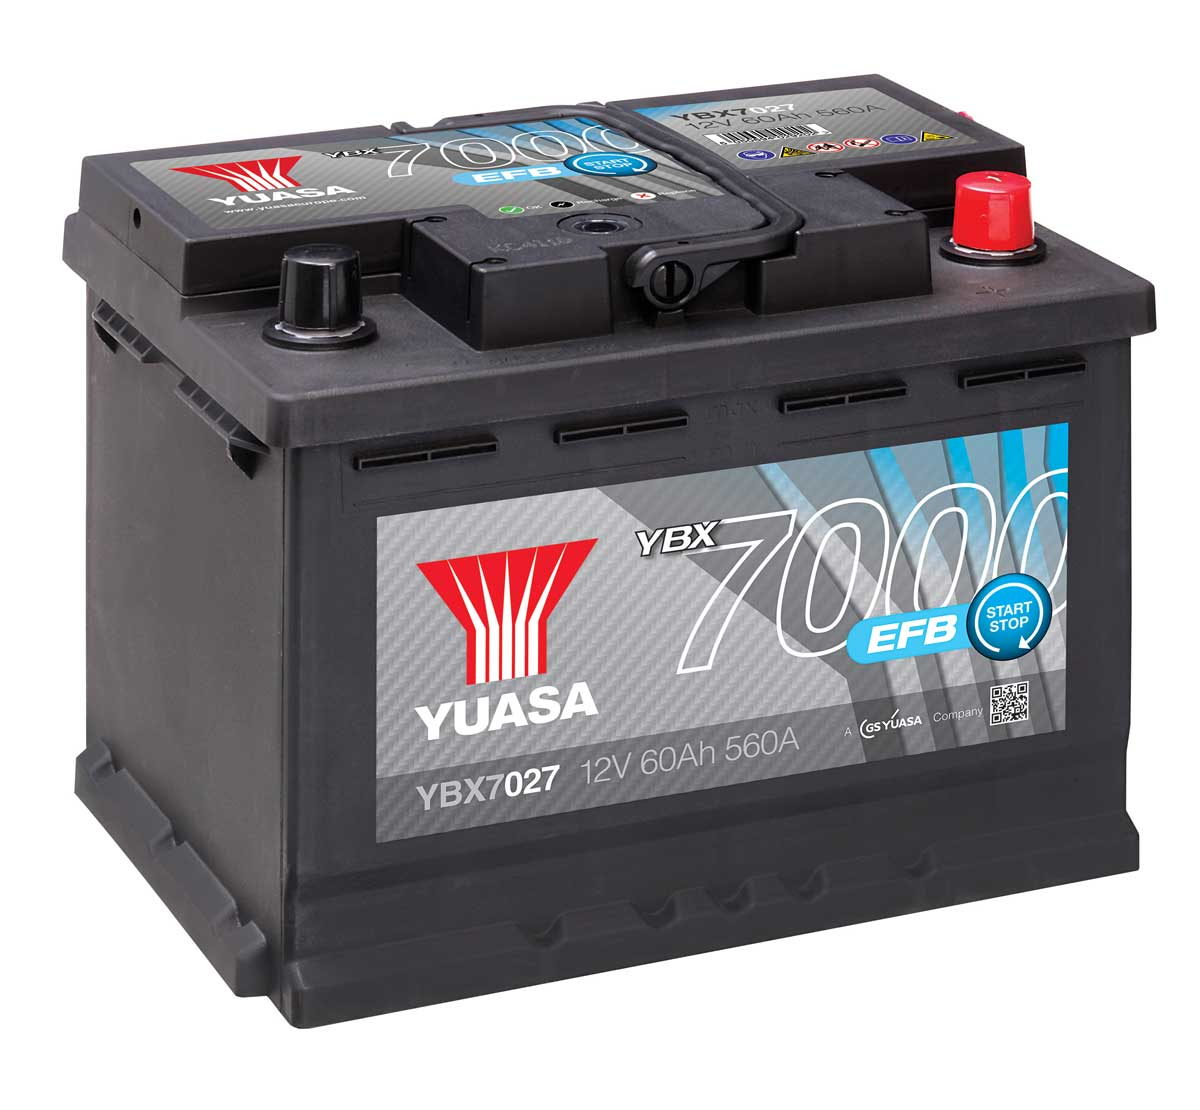 yuasa ybx7027 efb car battery mds battery. Black Bedroom Furniture Sets. Home Design Ideas